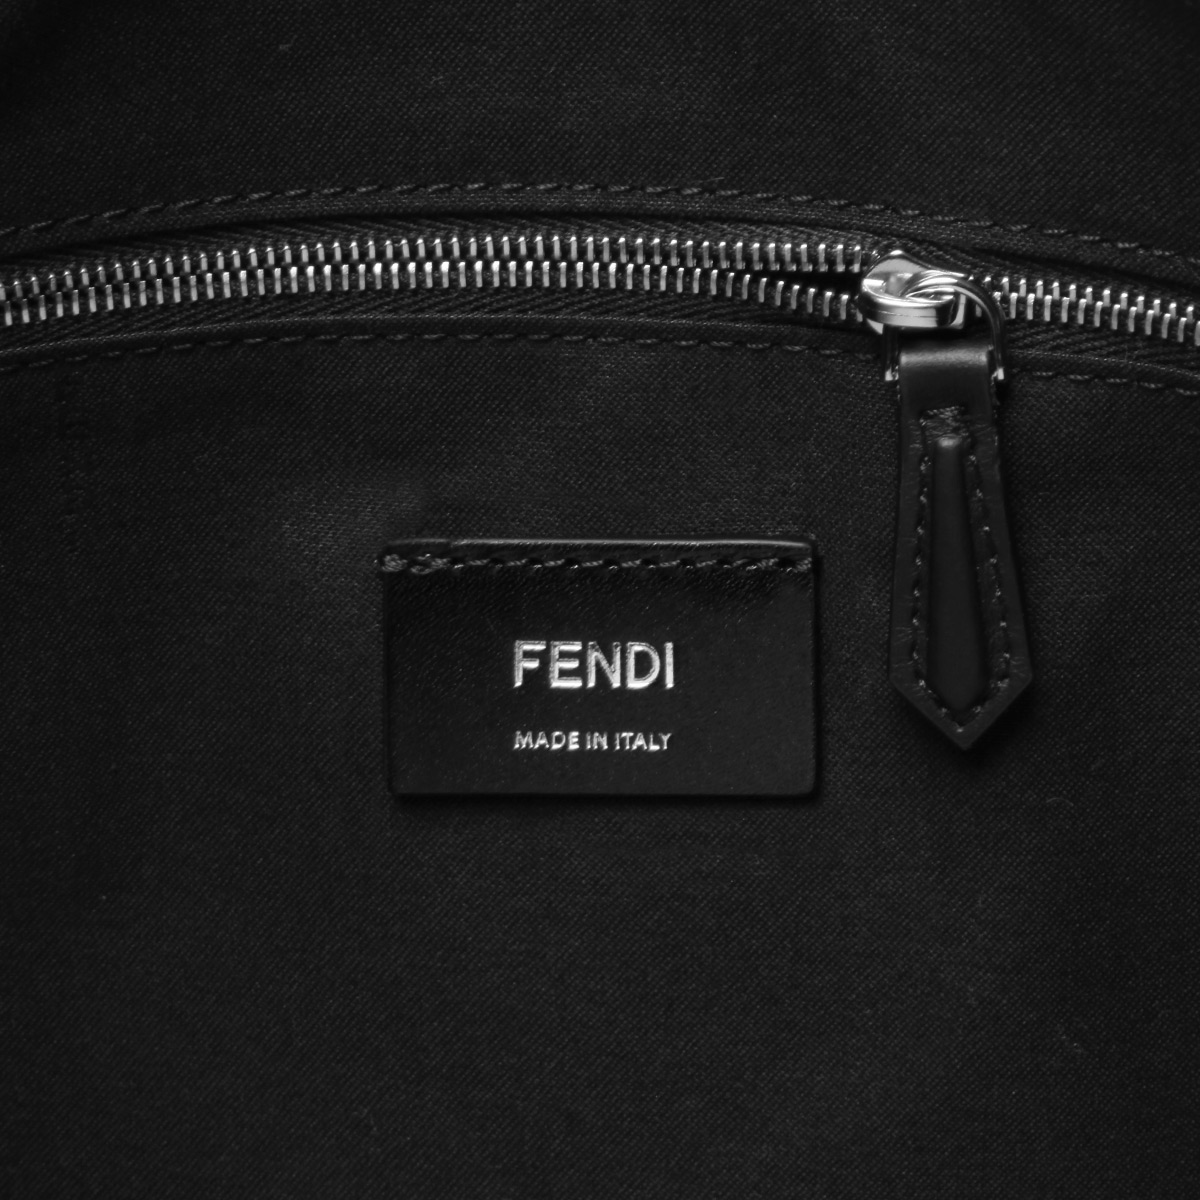 FENDI フェンディ | ショルダーバッグ ミディアム